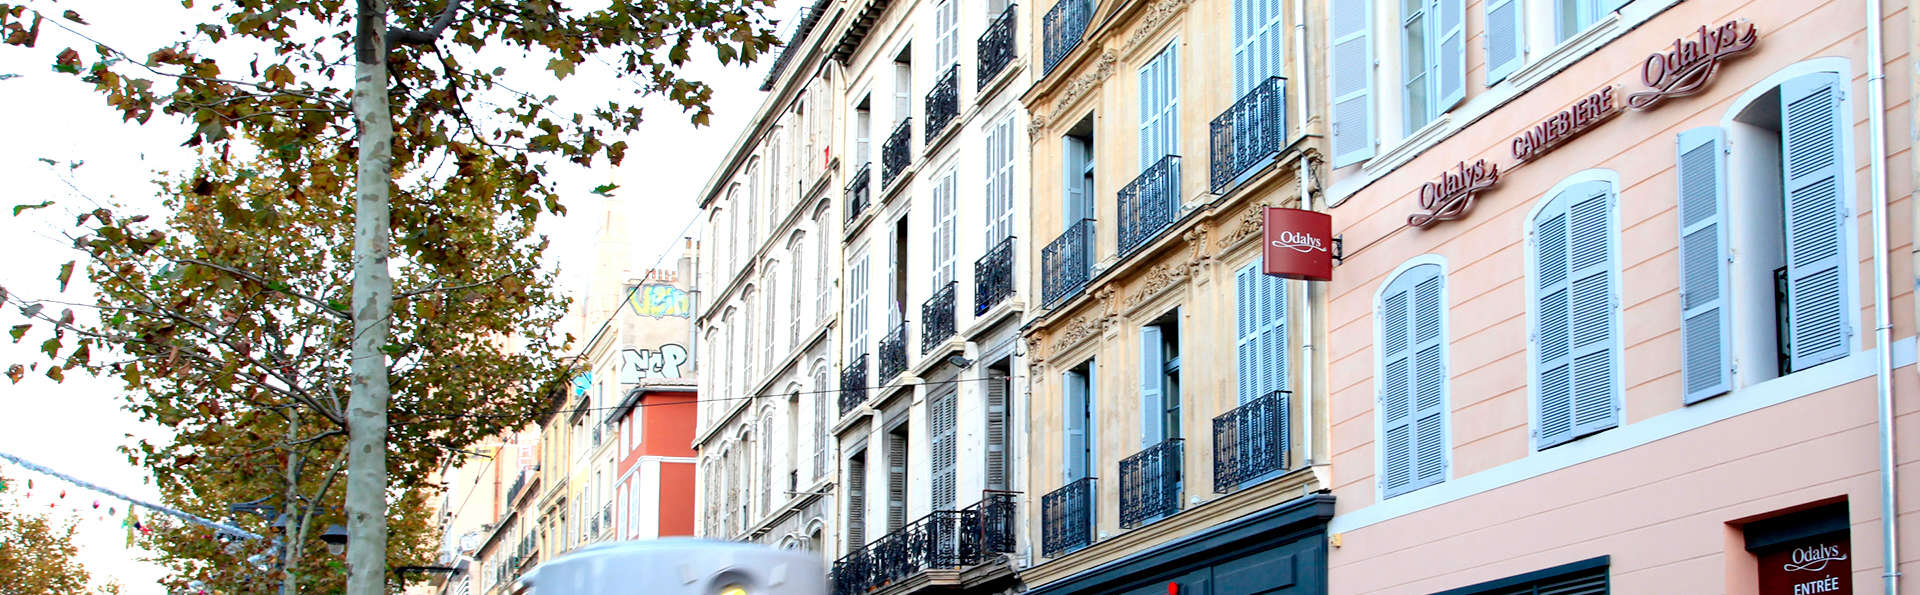 Appart Hotel Odalys Marseille Canebiere 3 Marseille France